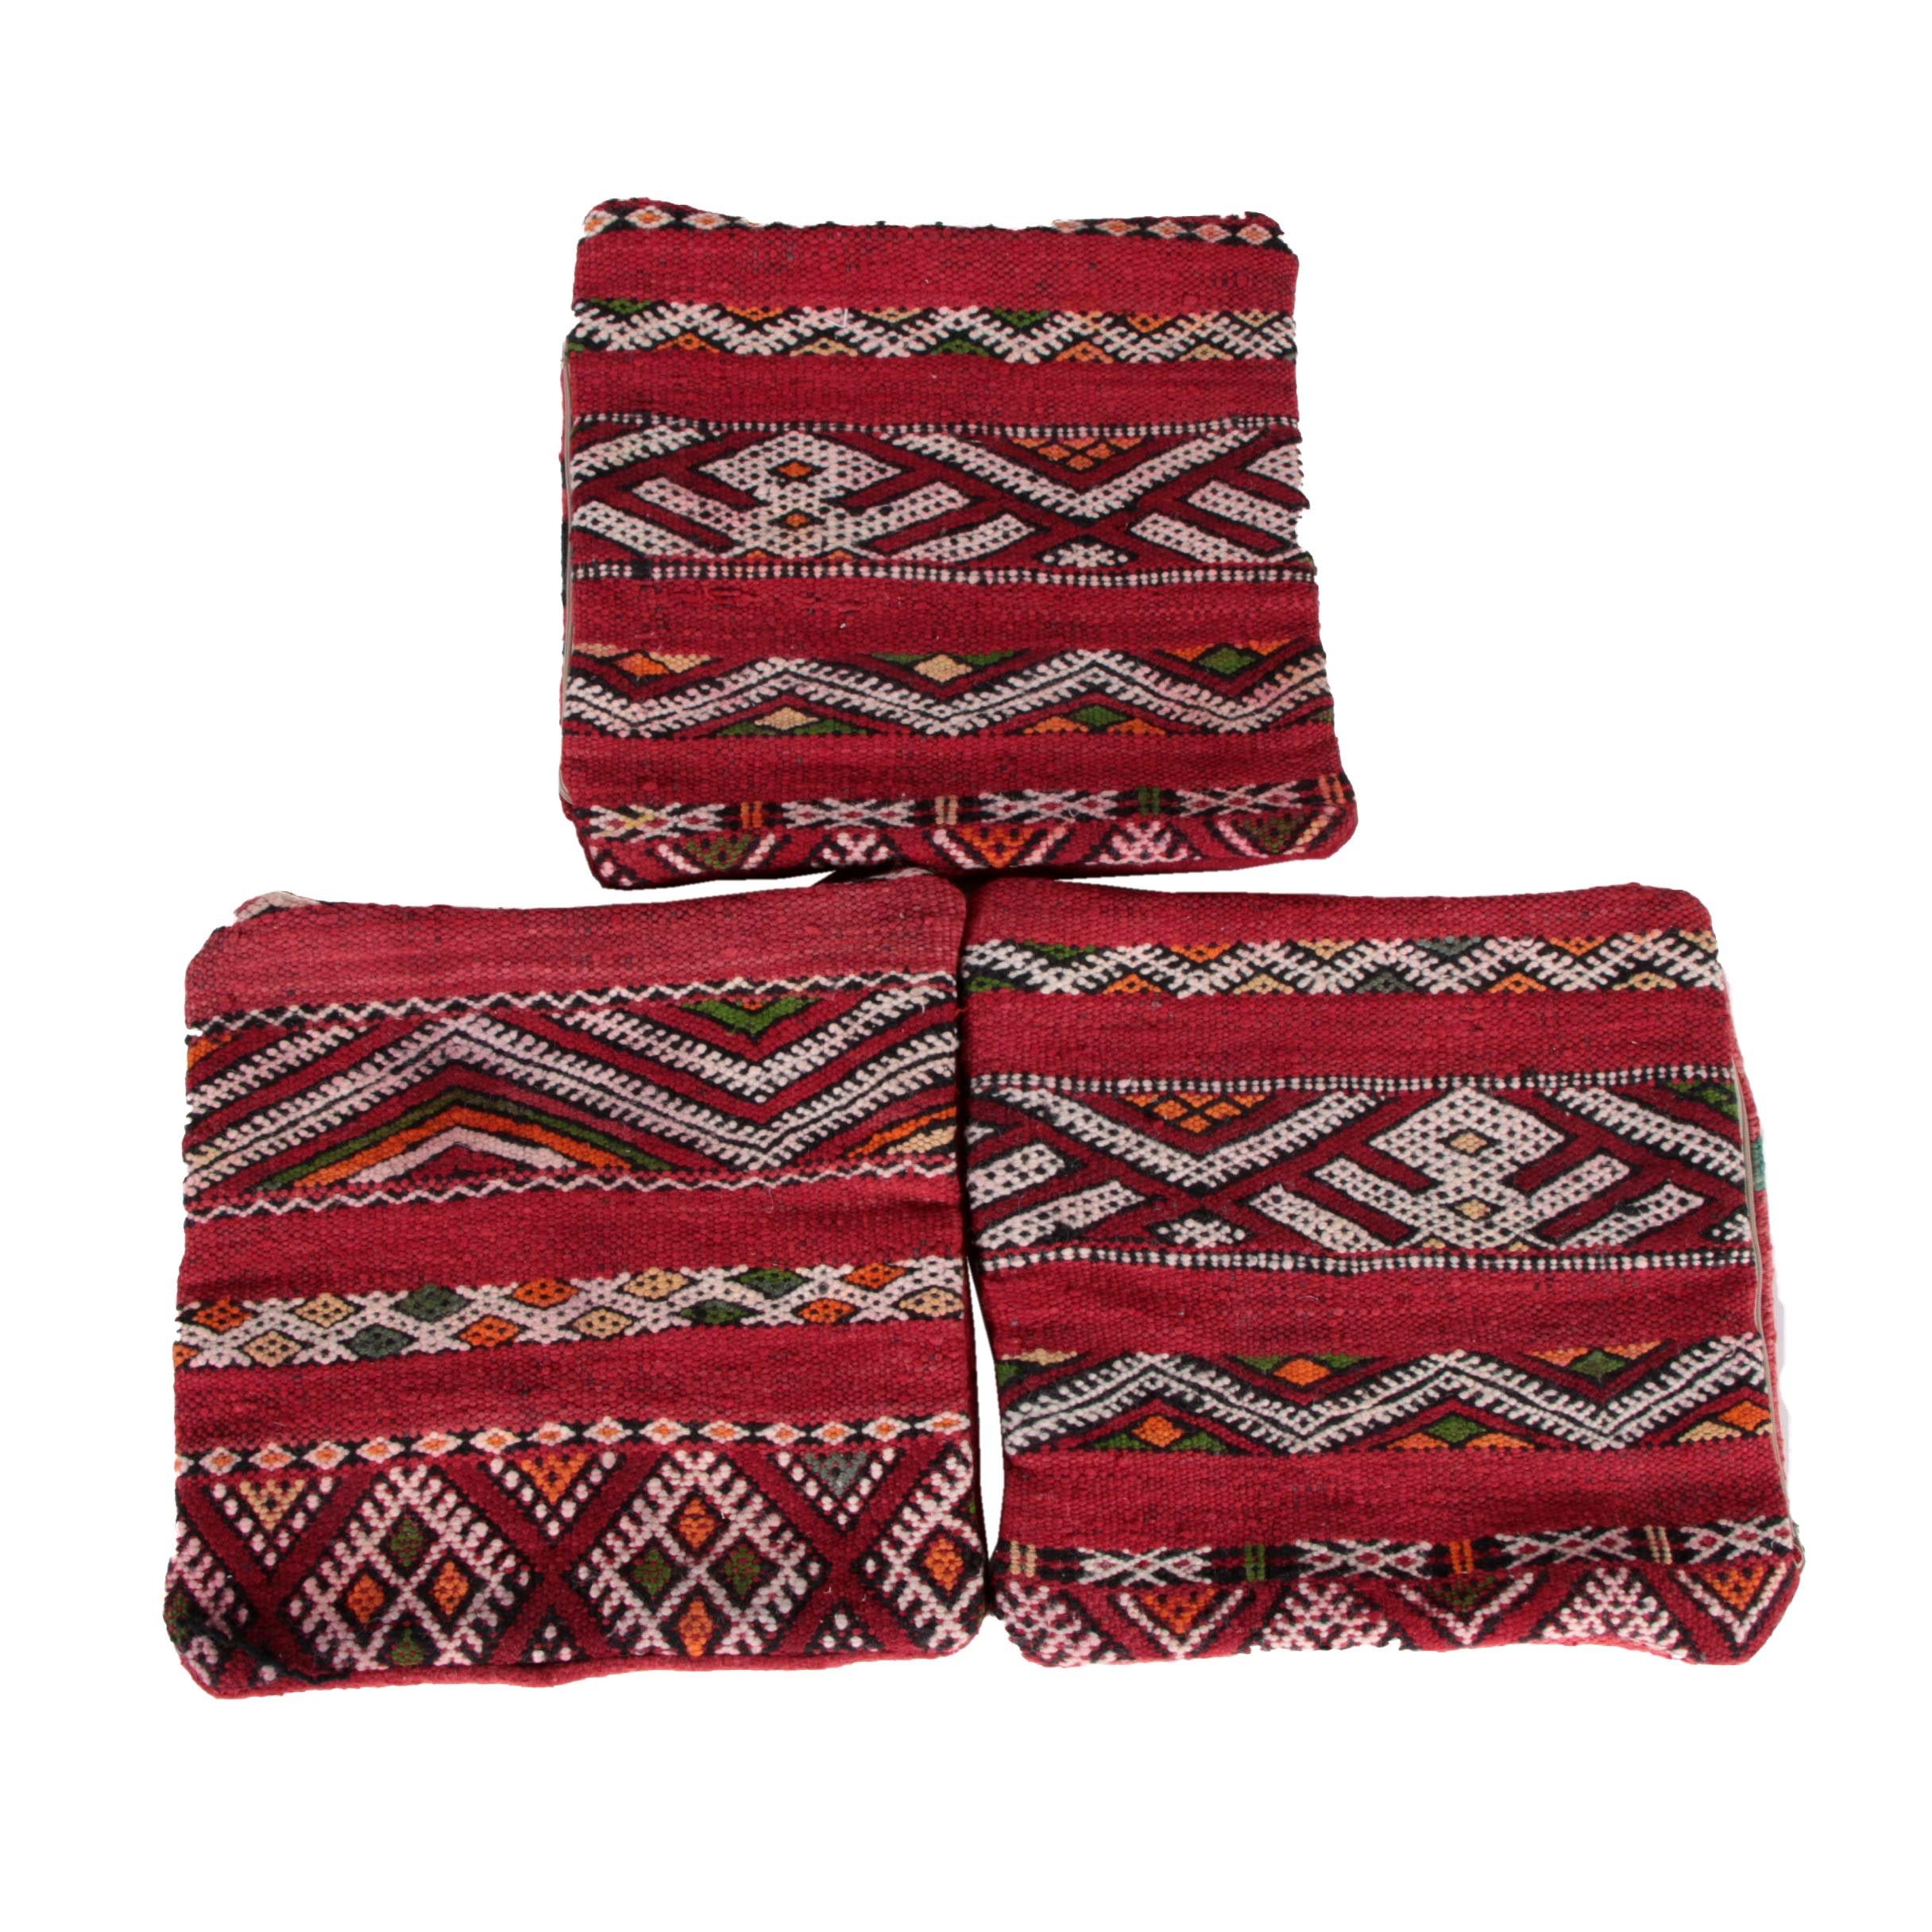 Woven Wool Pillowcases